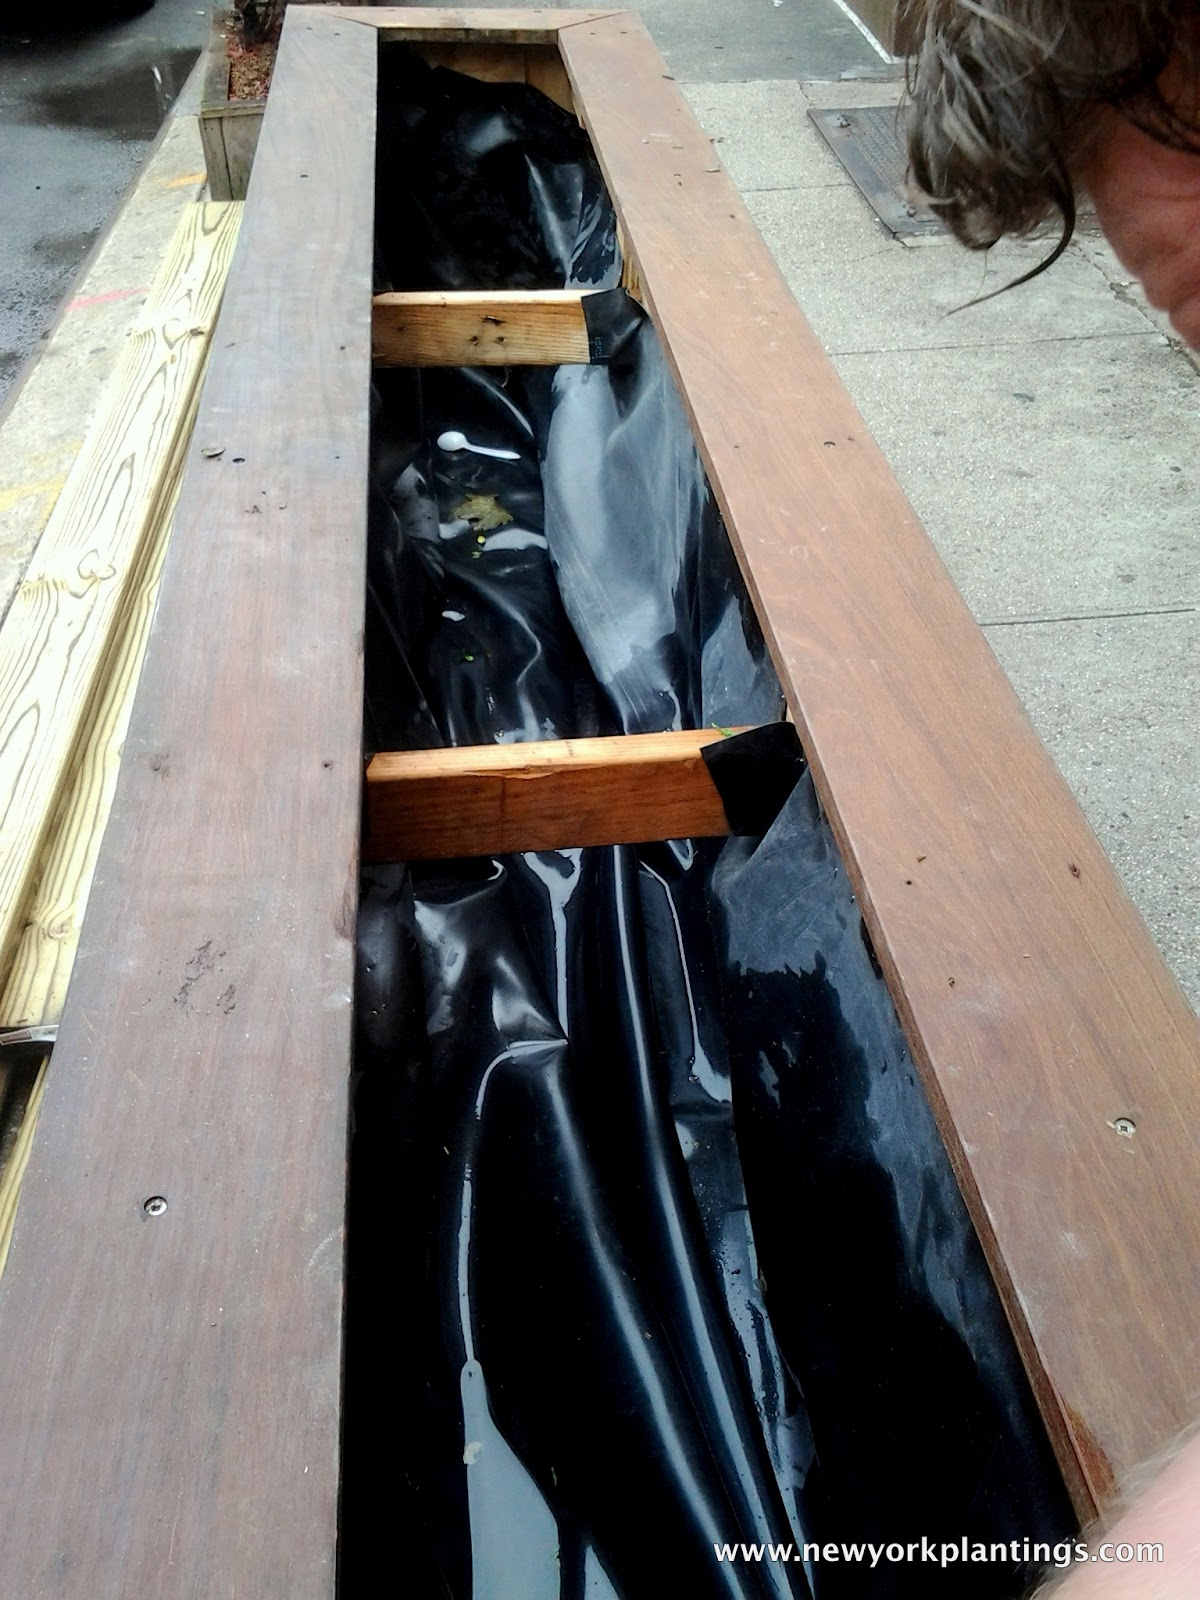 New York Plantings Custom Planter Boxes Aesthetic Efficacies